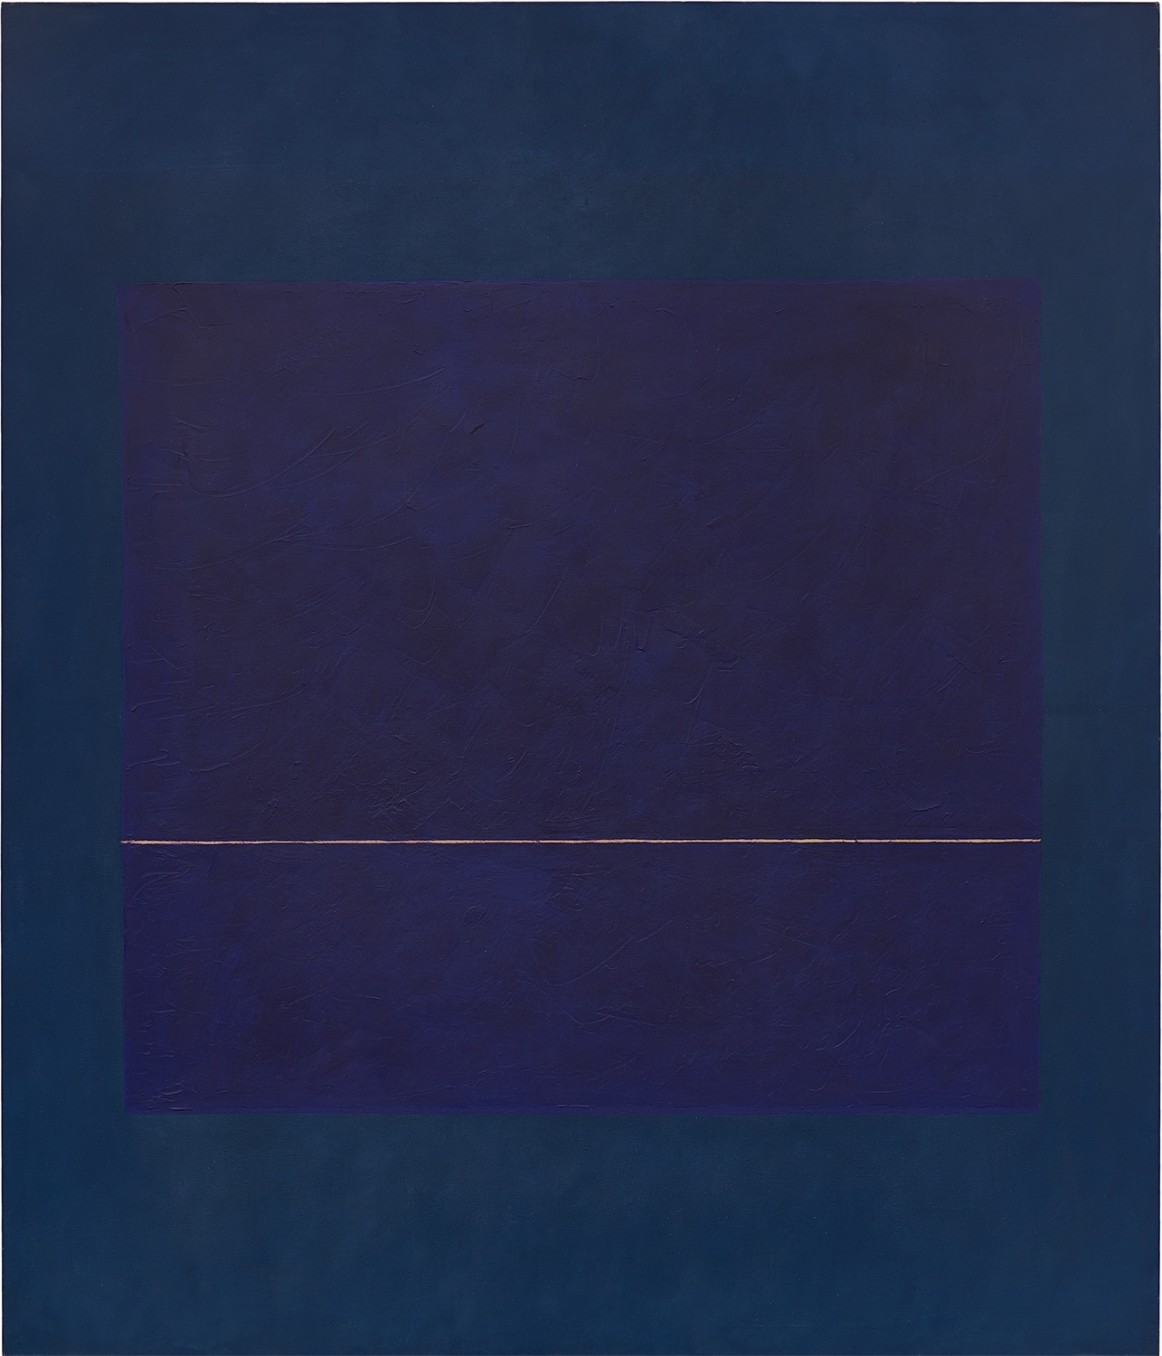 Virginia Jaramillo, Blue Space, 1974, Oil on canvas, 208.3 x 177.8 cm, 82 x 70 in